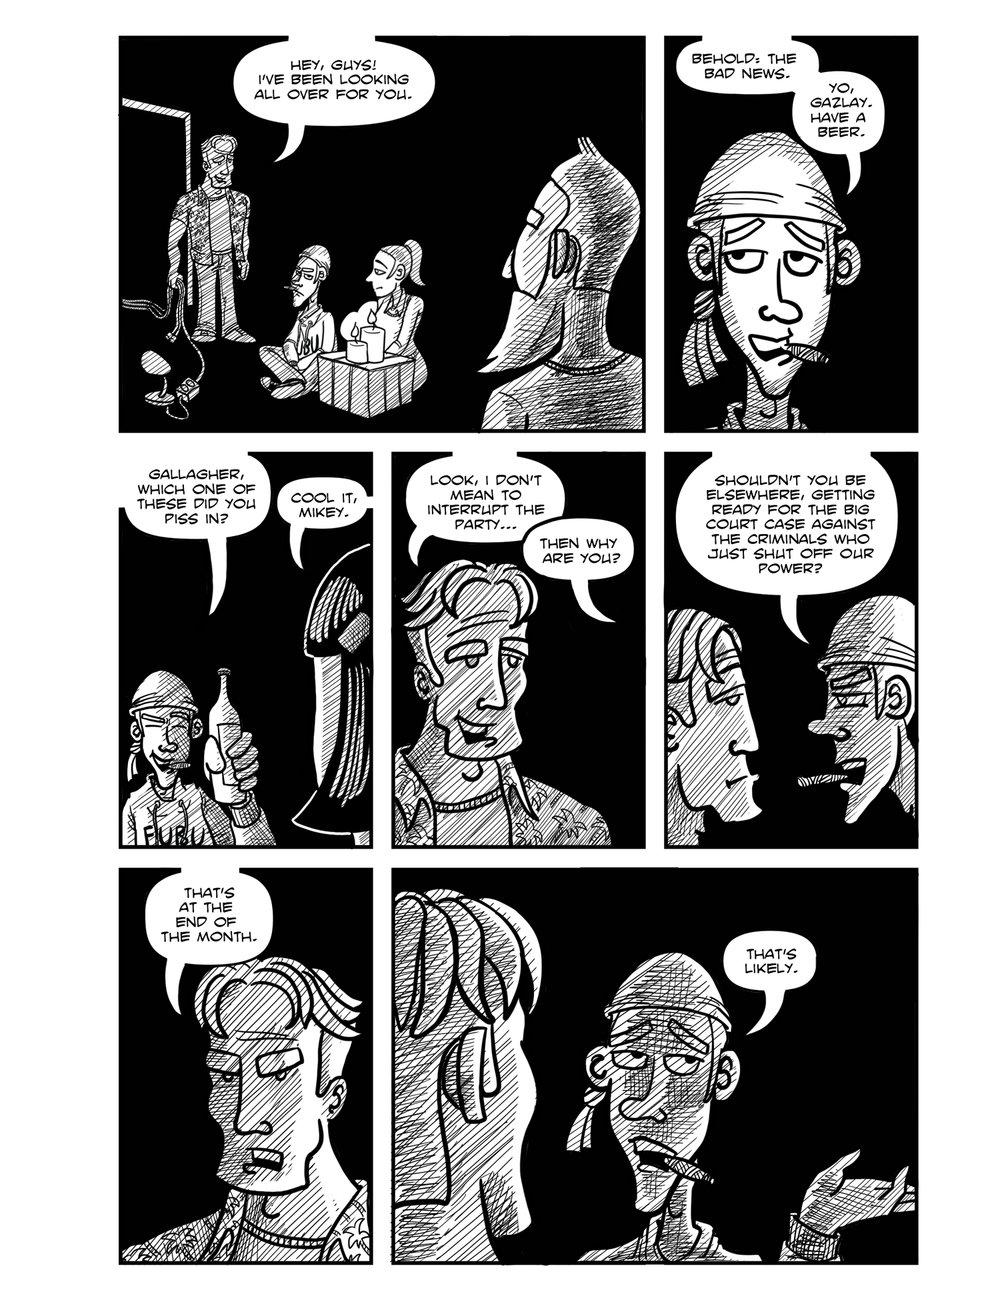 PAGE-172.jpg